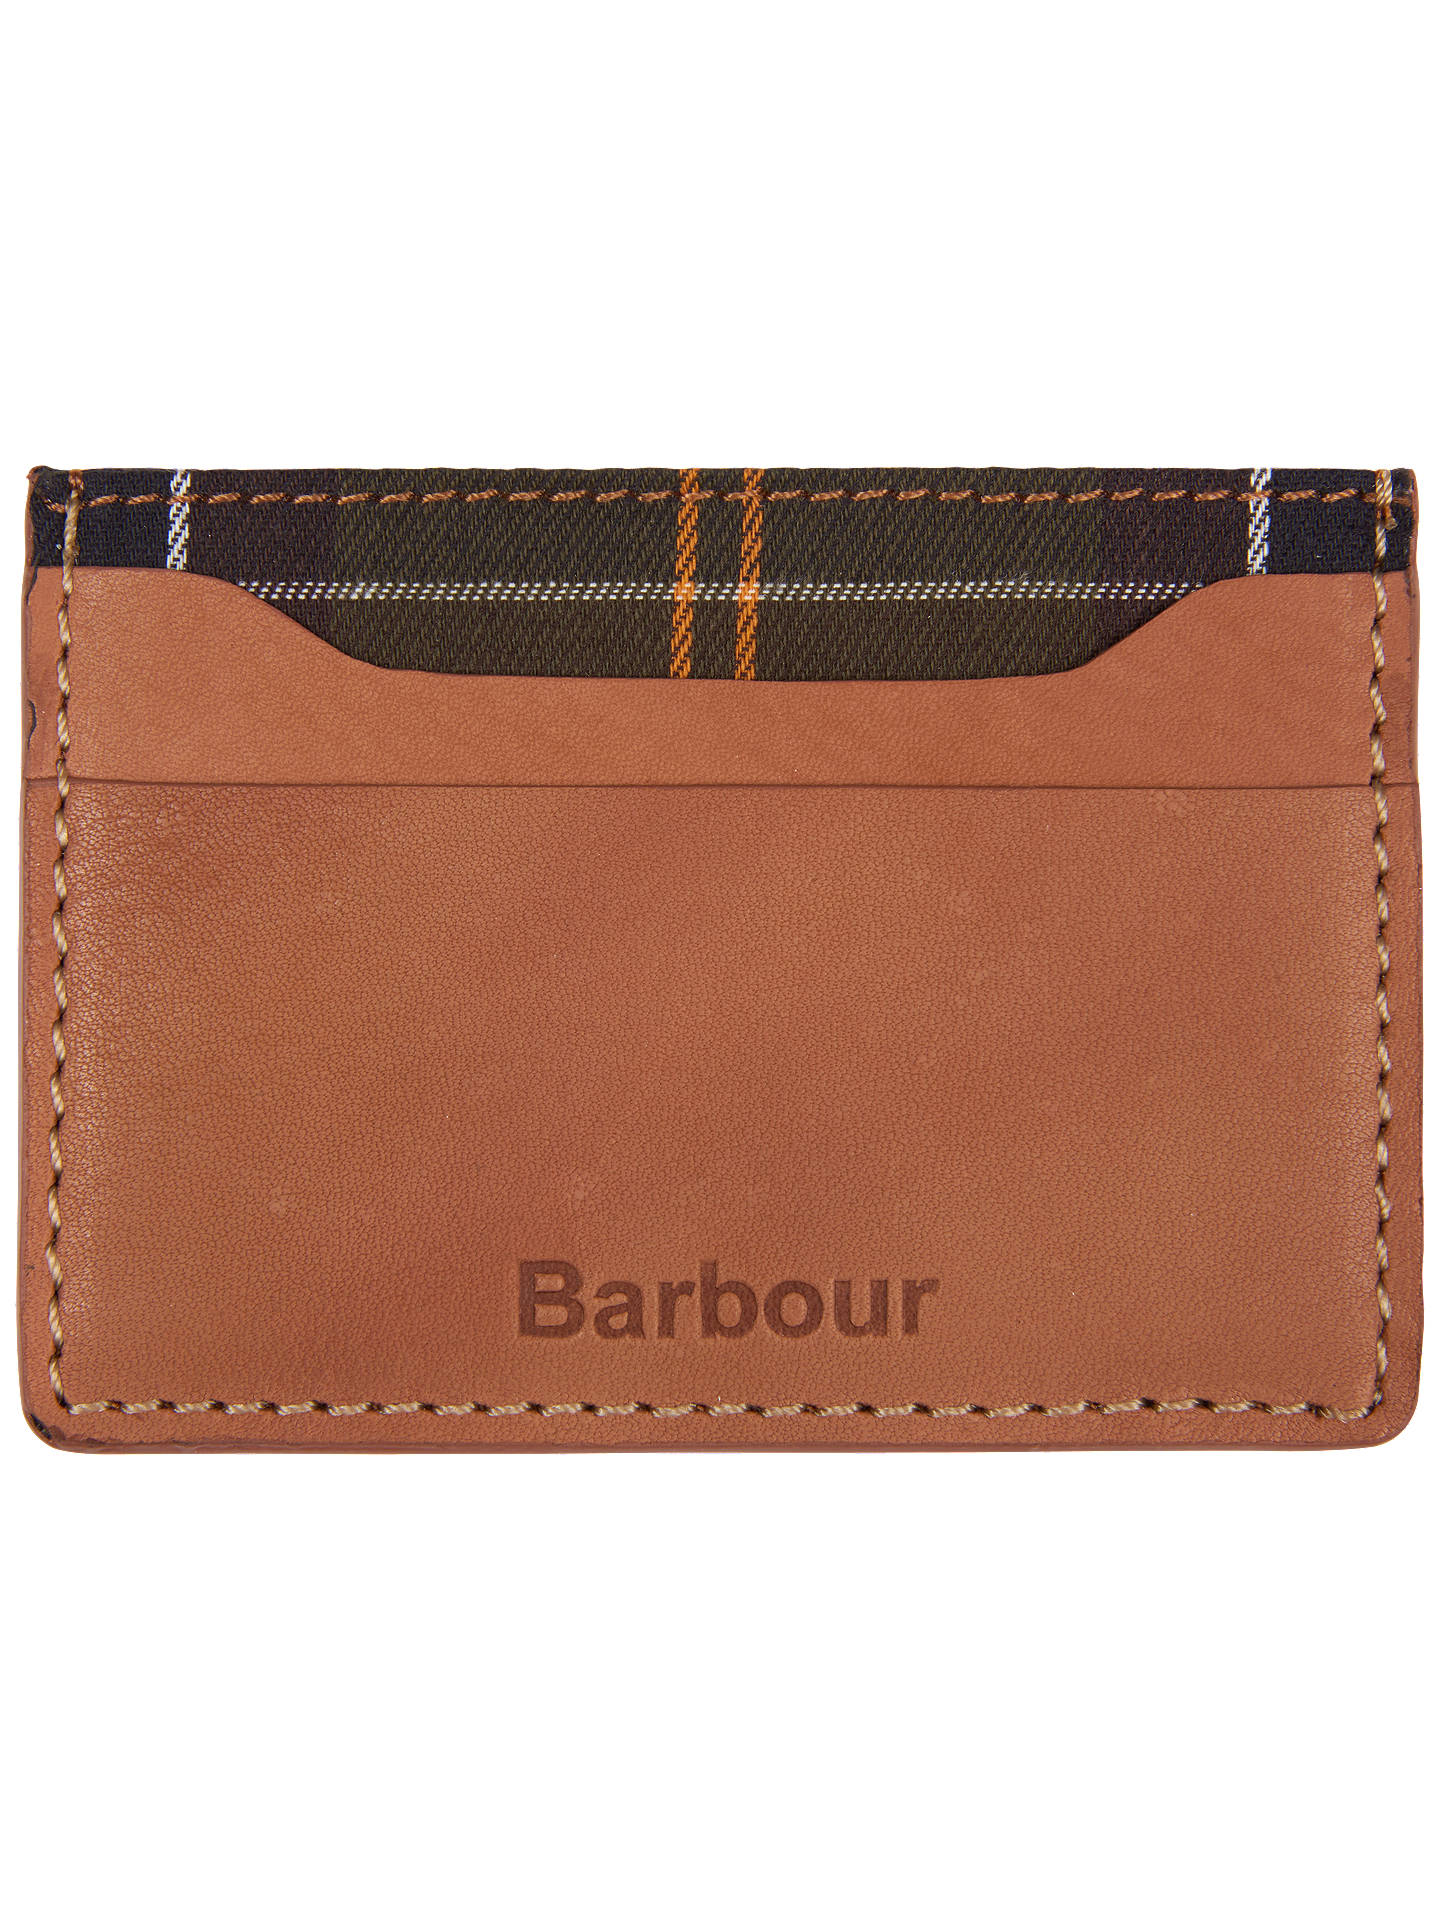 Barbour Leather Artisan Card Holder, Tan, Tan